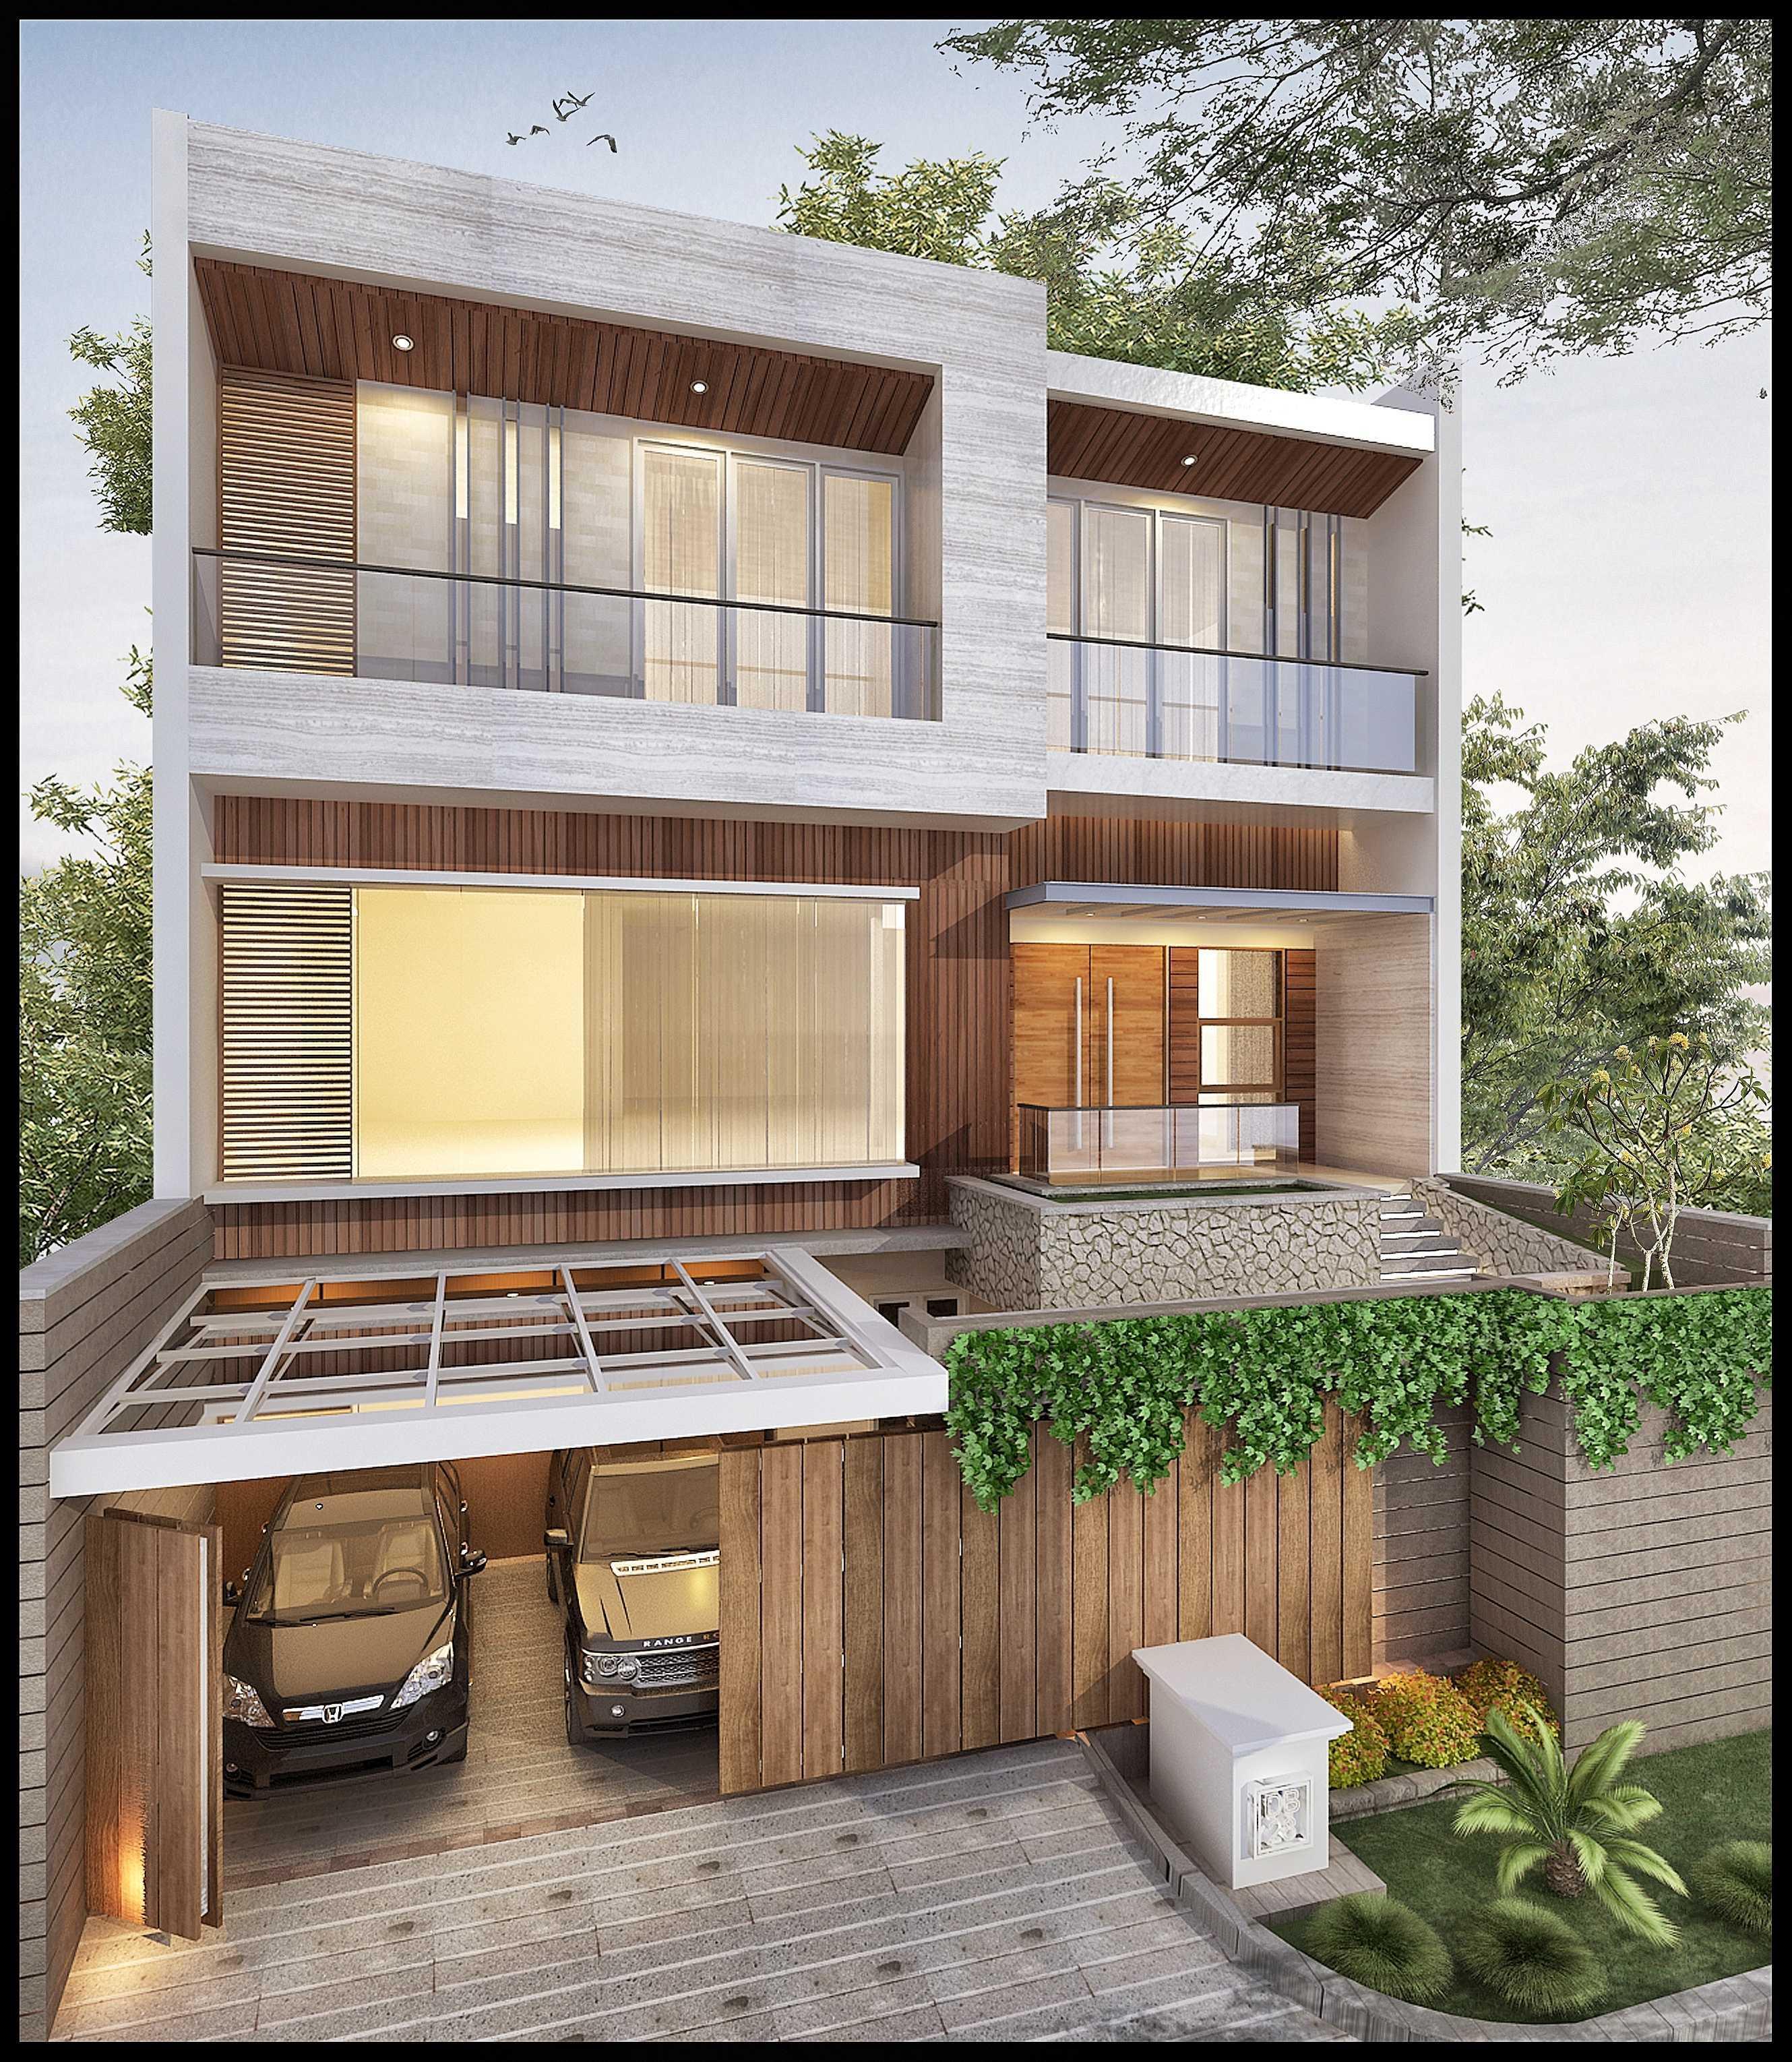 Ed Architect Modern Private House 2 Kelapa Gading, North Jakarta City, Jakarta, Indonesia Kelapa Gading, North Jakarta City, Jakarta, Indonesia R8Final-Mr-Handy-View-02 Modern  34392